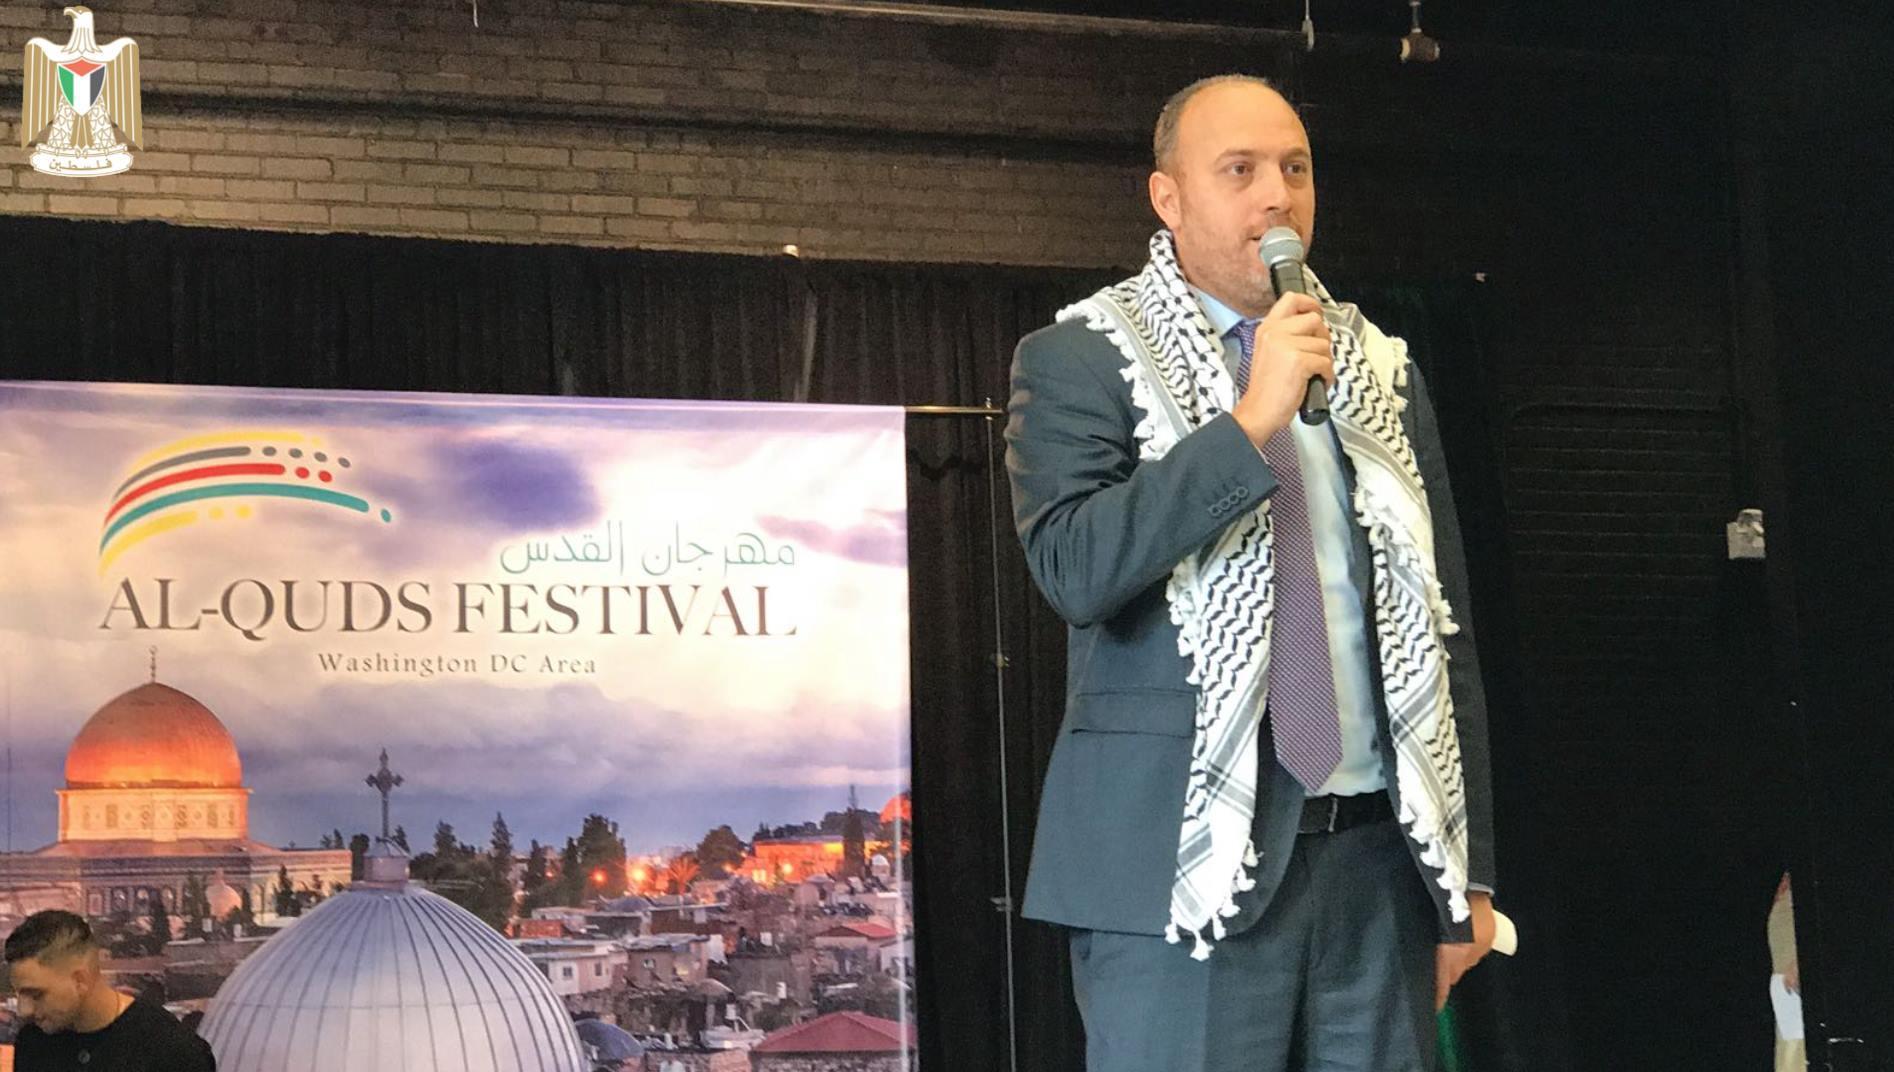 Al Quds Festival